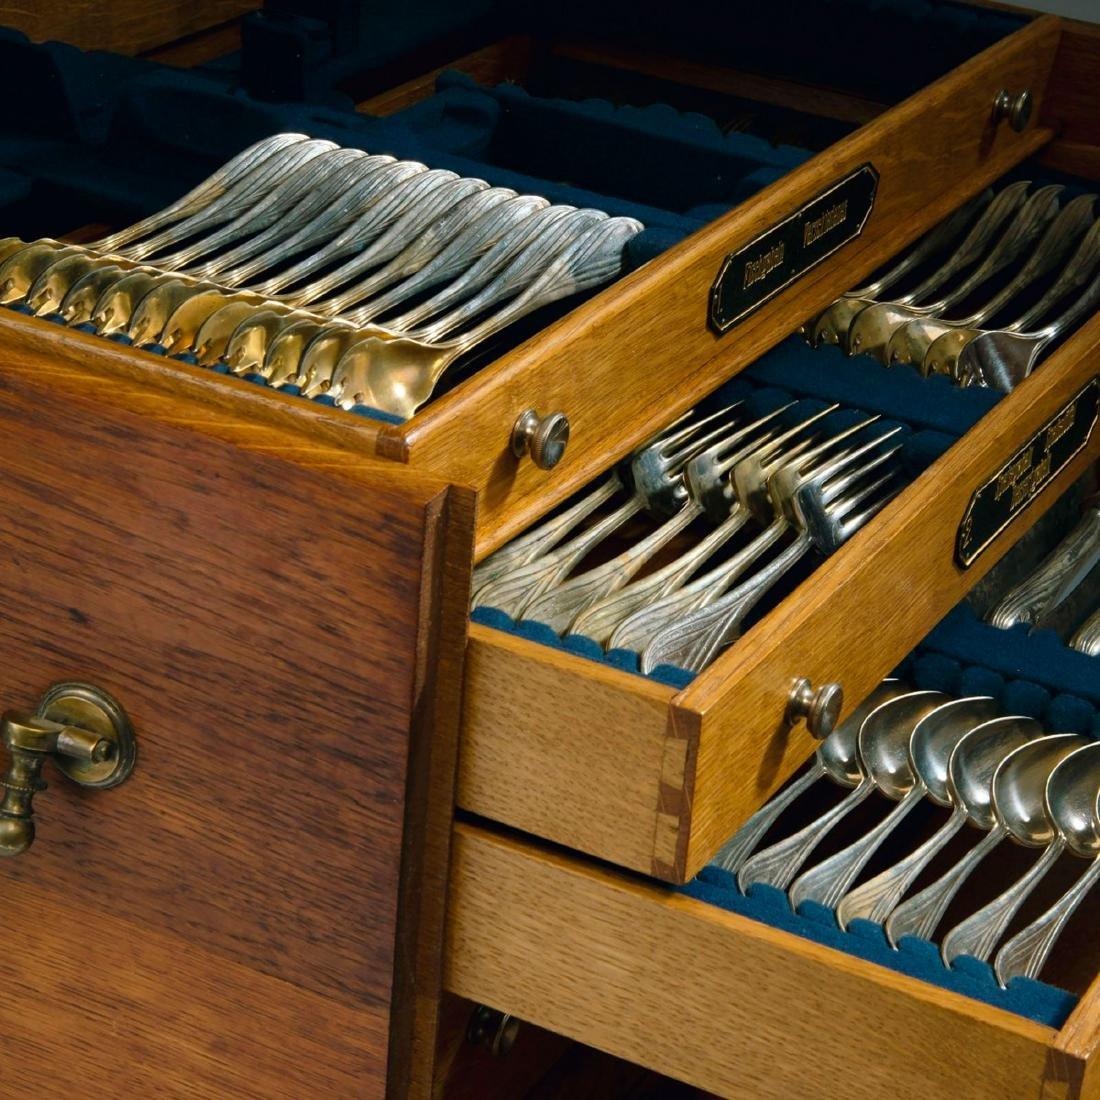 '3001' cutlery in original wooden box, 1901/02 - 3